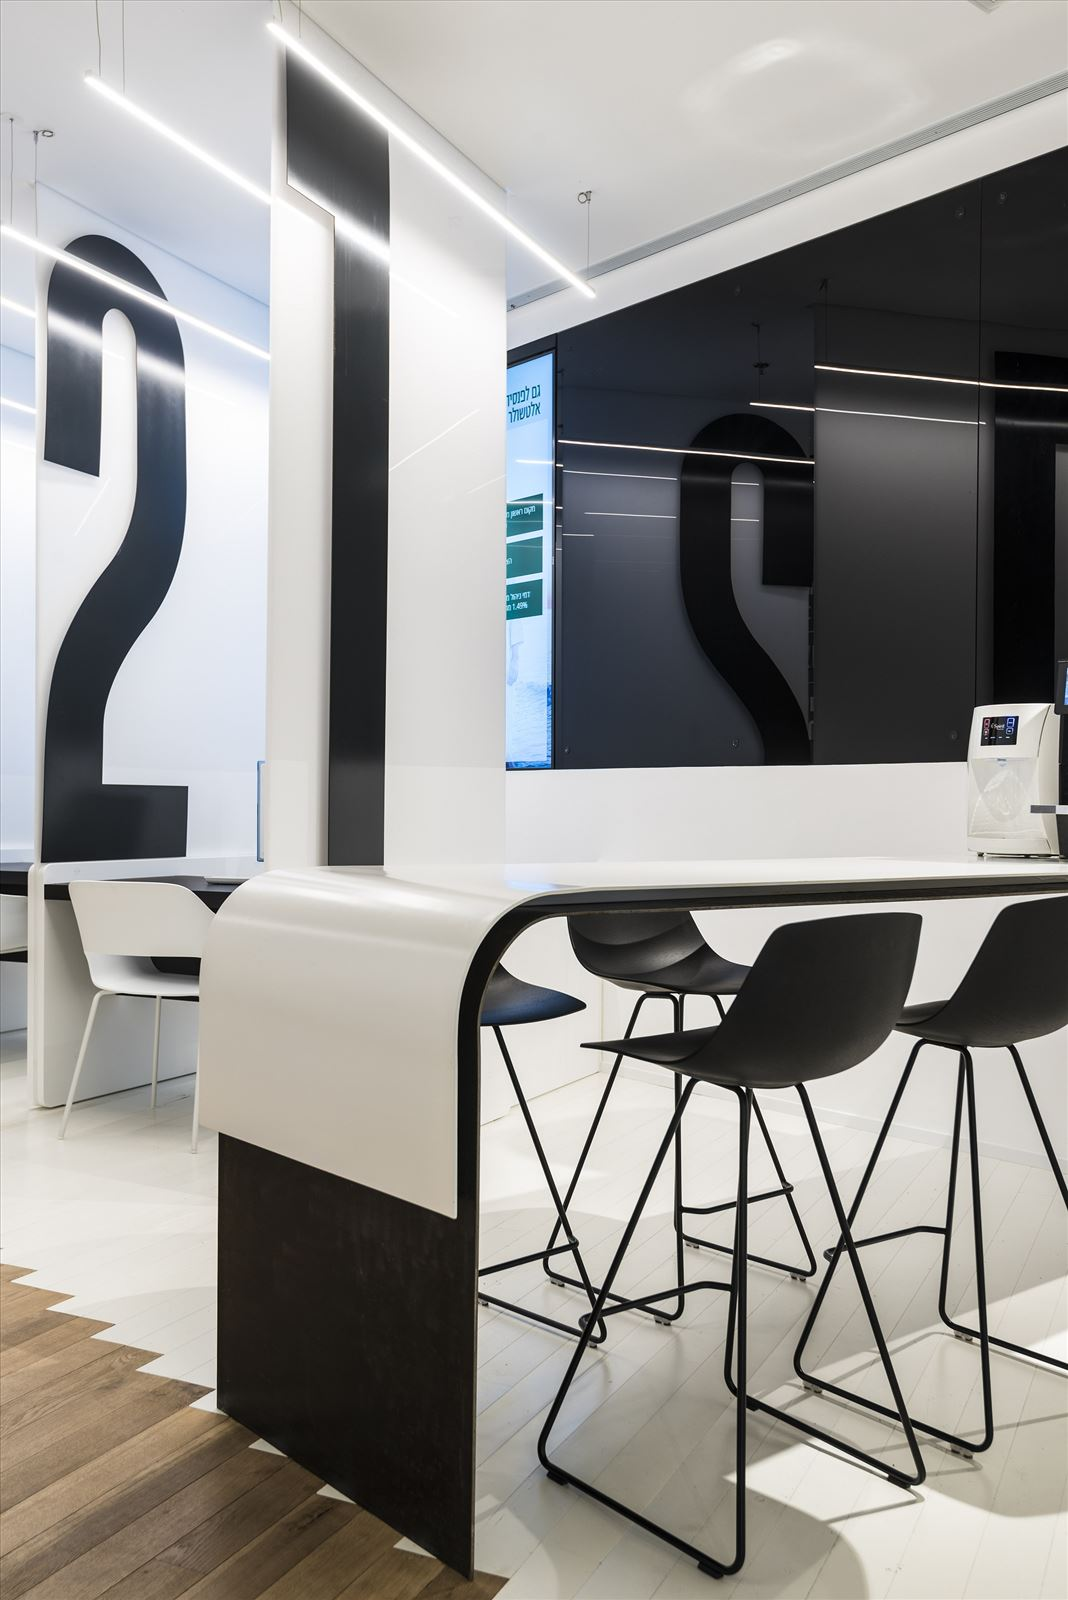 Office lighting project מנורות תלויות במשרד מבית דורי קמחי